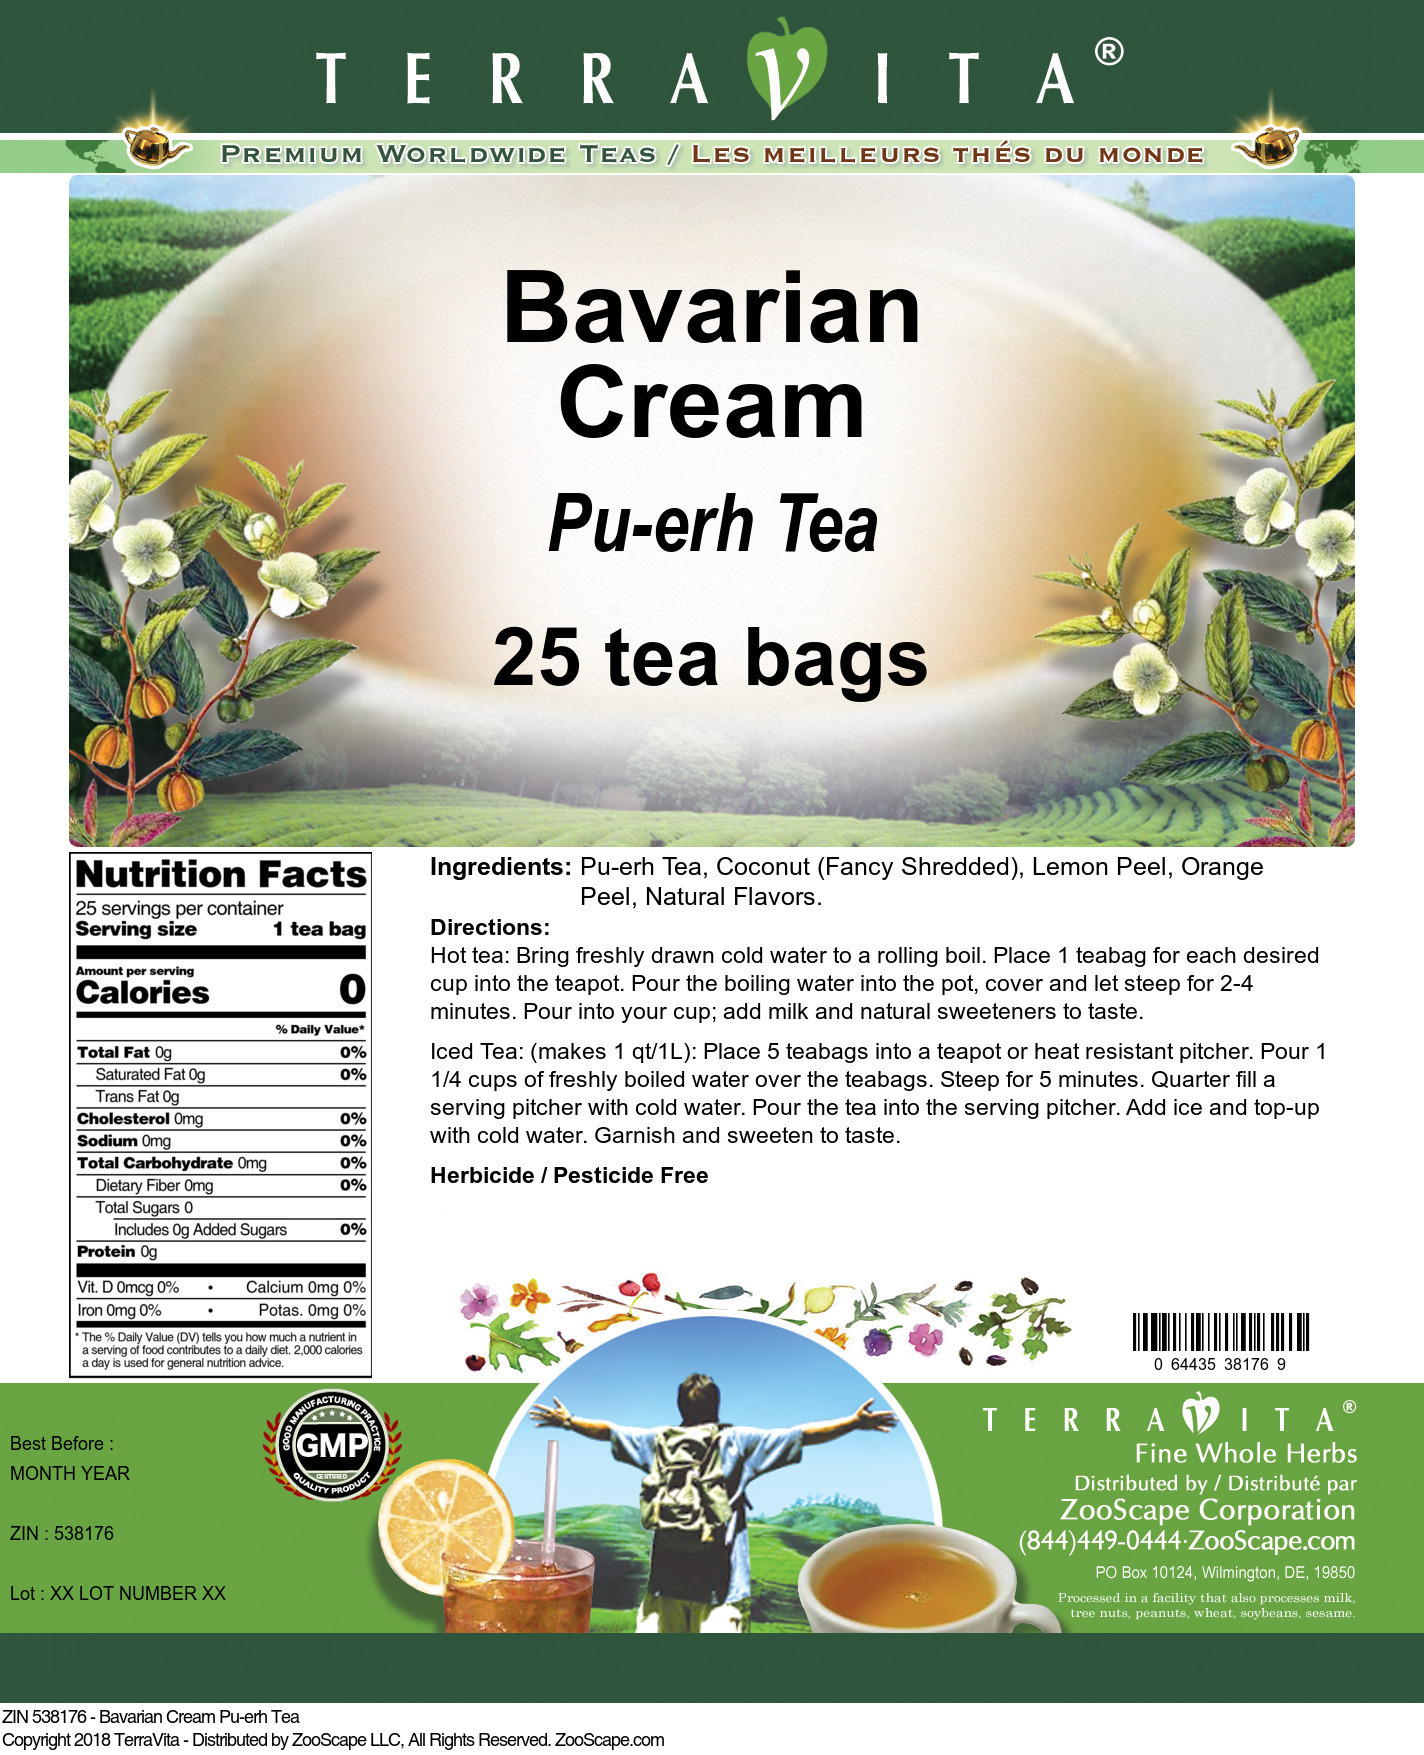 Bavarian Cream Pu-erh Tea